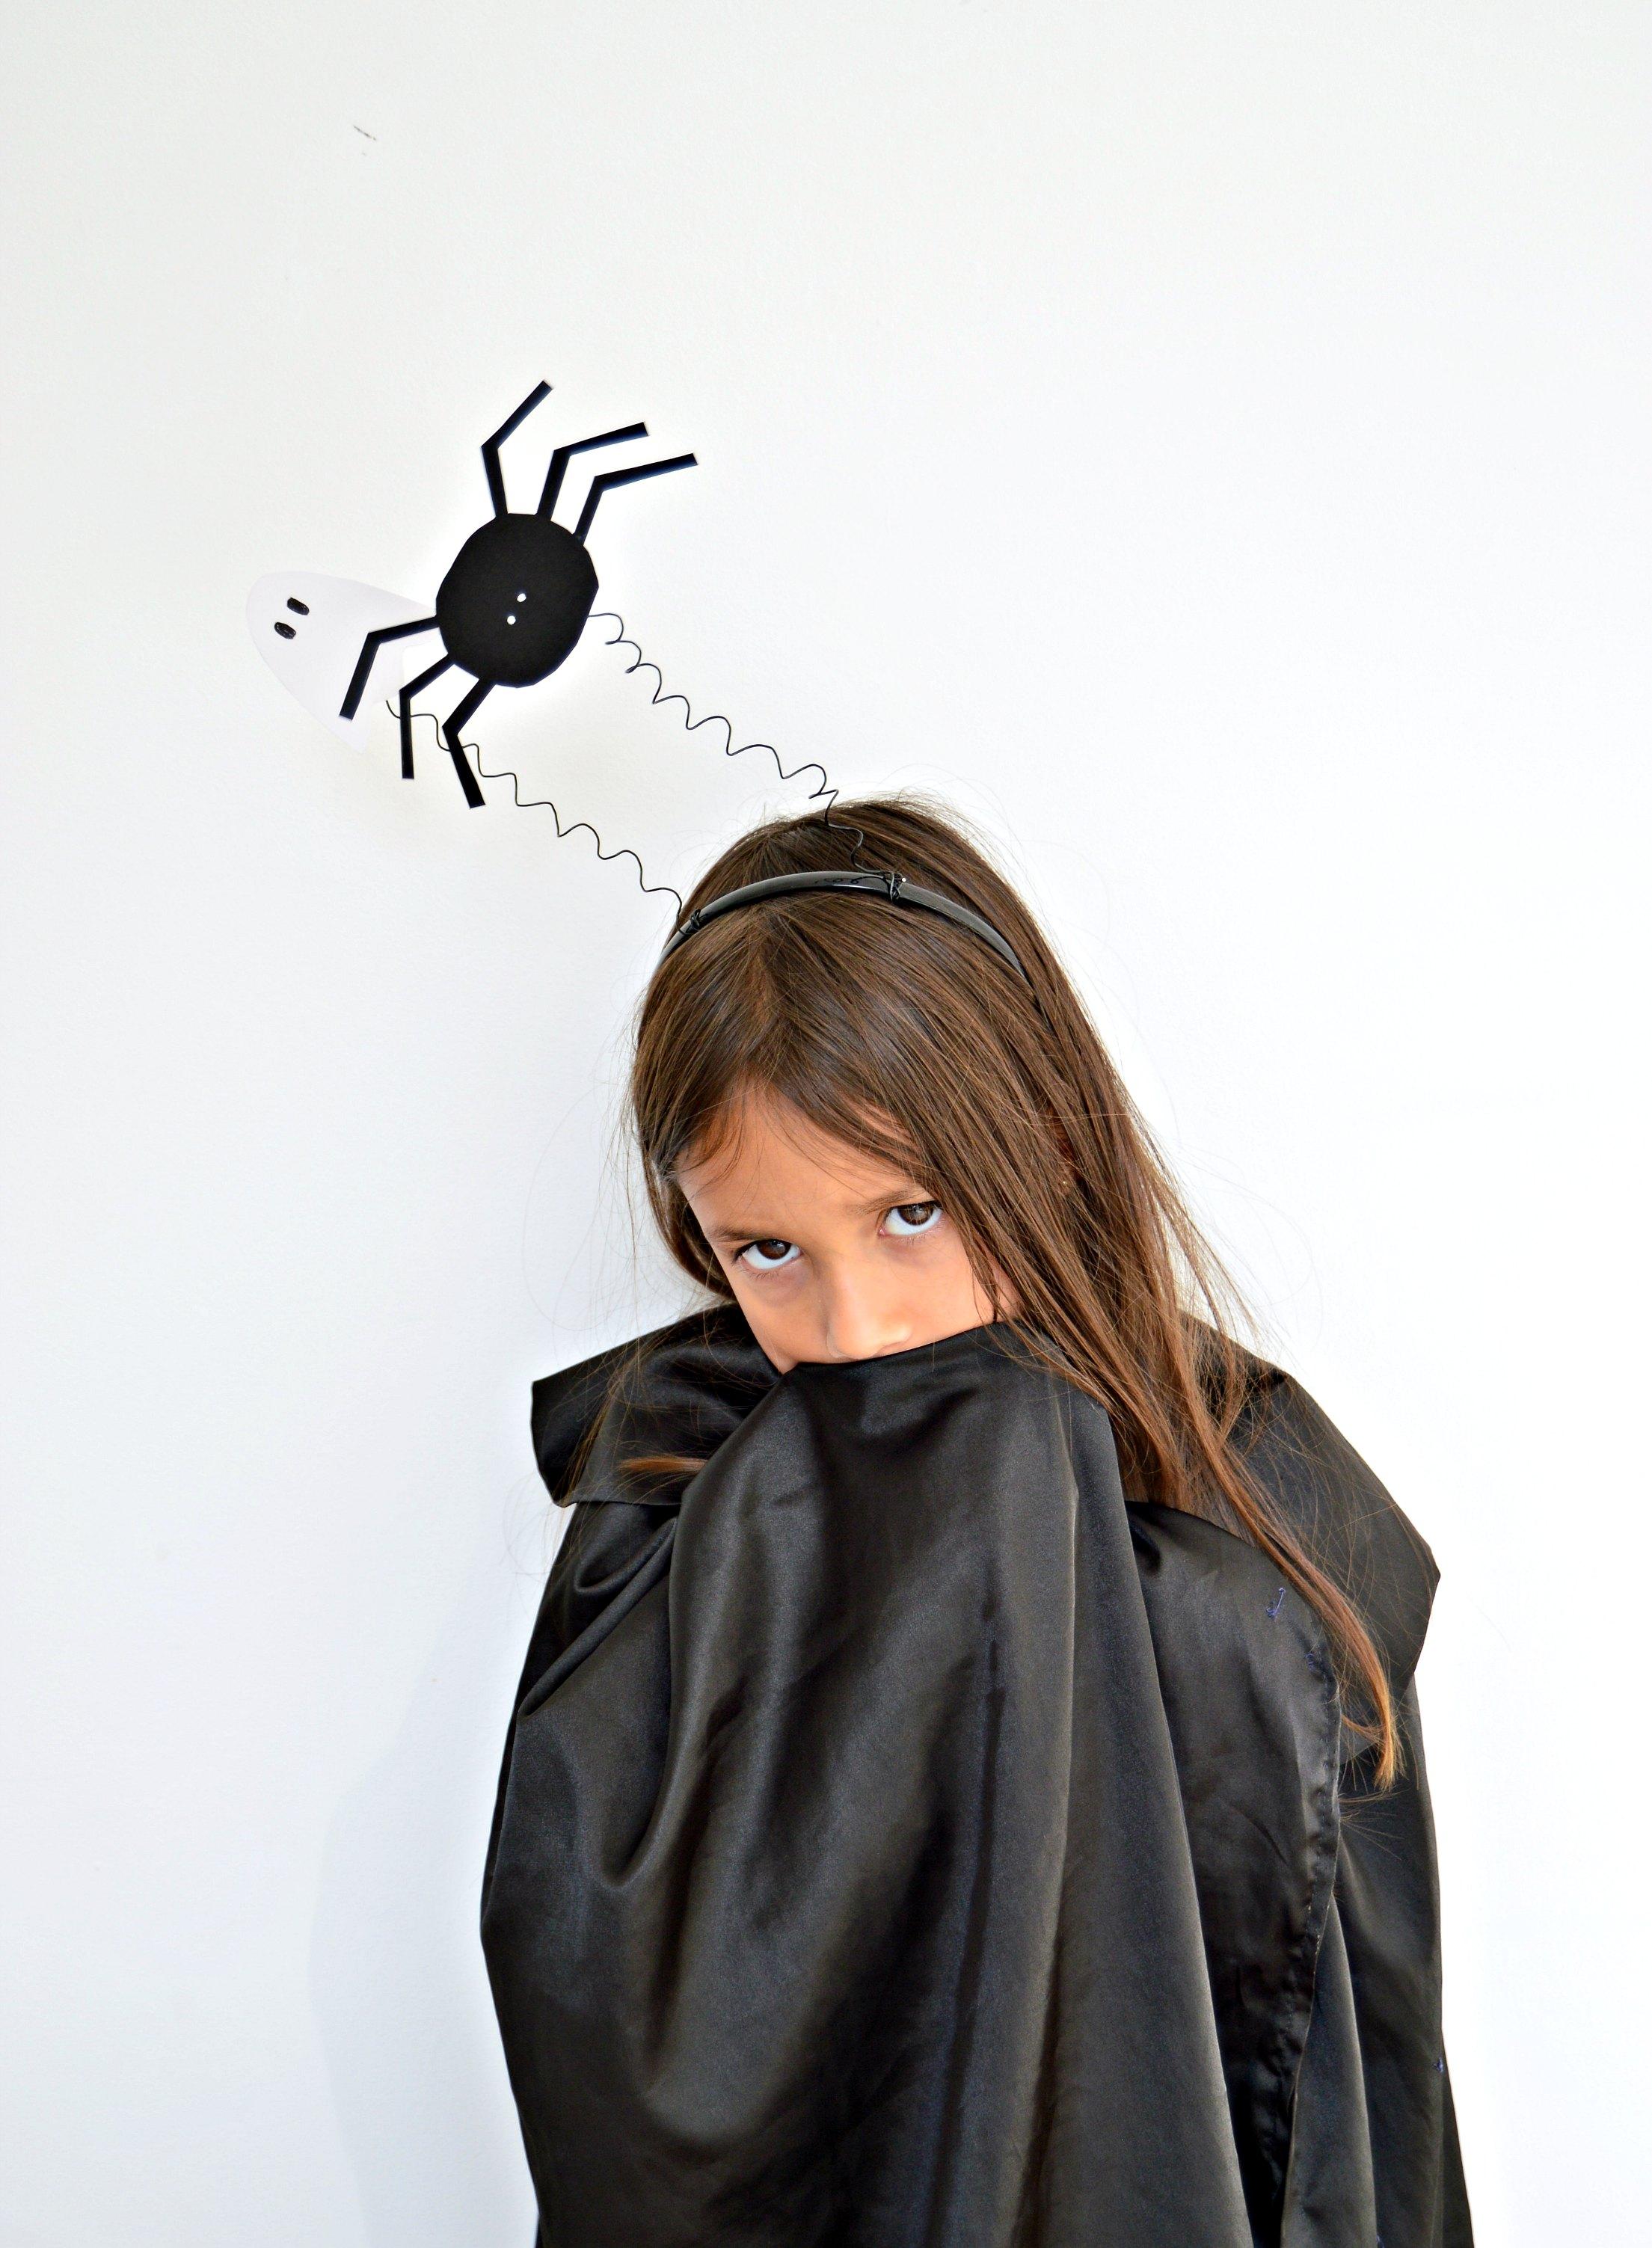 bouncy diy halloween headbands (with video!) - diy home decor - your